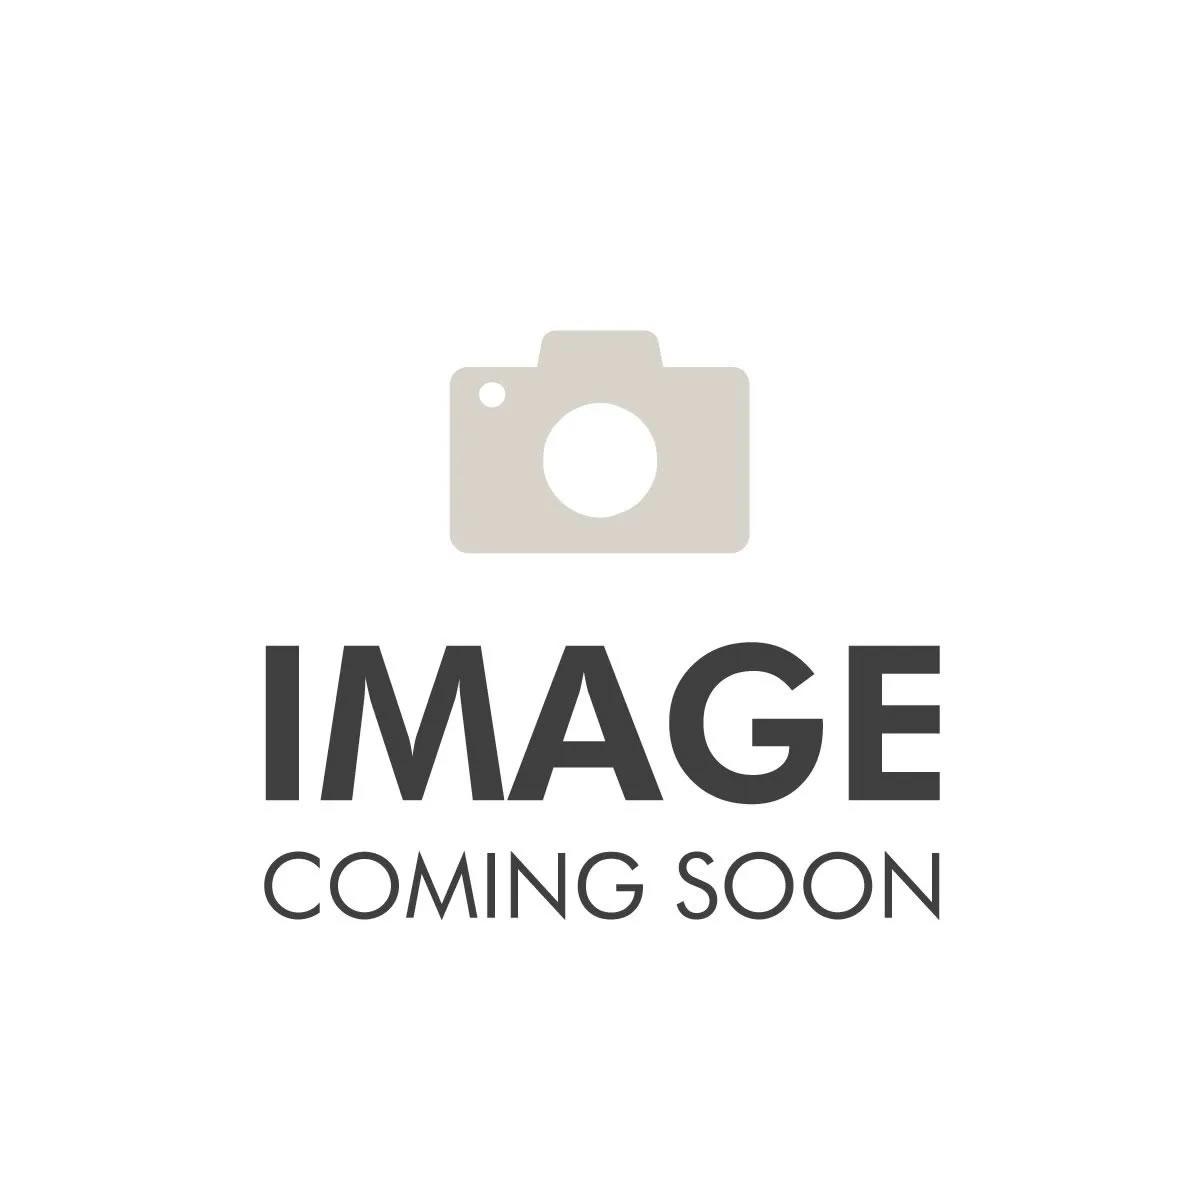 [SCHEMATICS_4JK]  Headlight Switch; 97-00 Jeep Wrangler TJ   1997 Jeep Headlight Switch Wiring      Auto Quest Jeeps